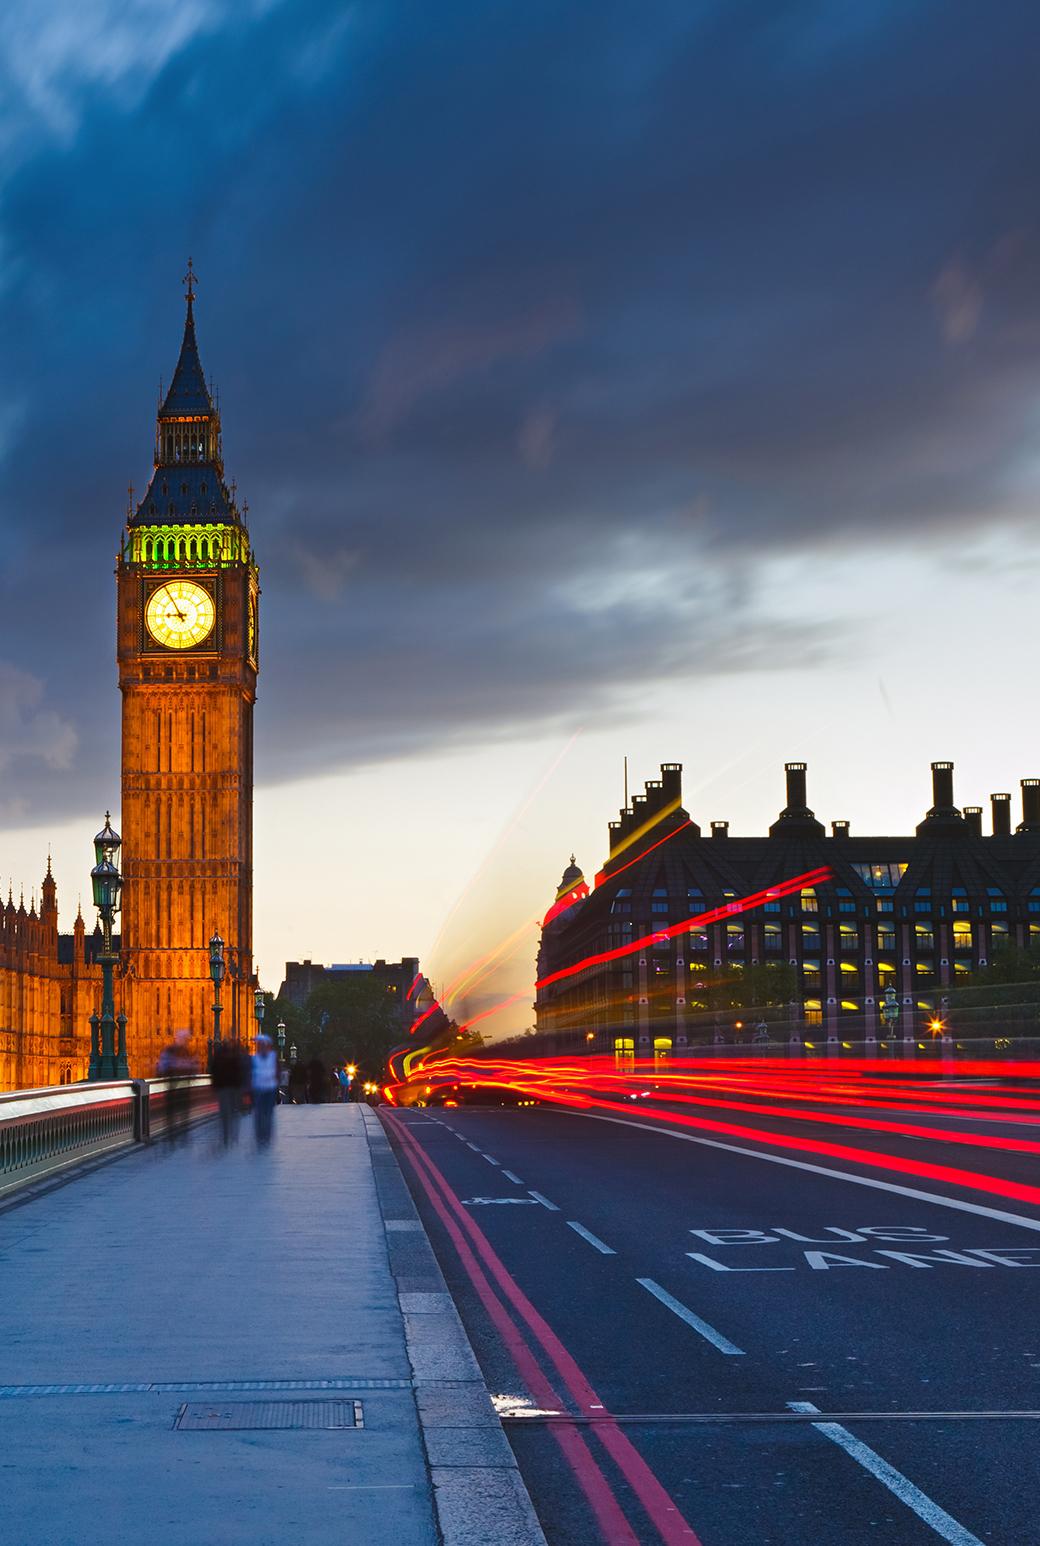 Big Ben London Wallpaper for iPhone X, 8, 7, 6 - Free